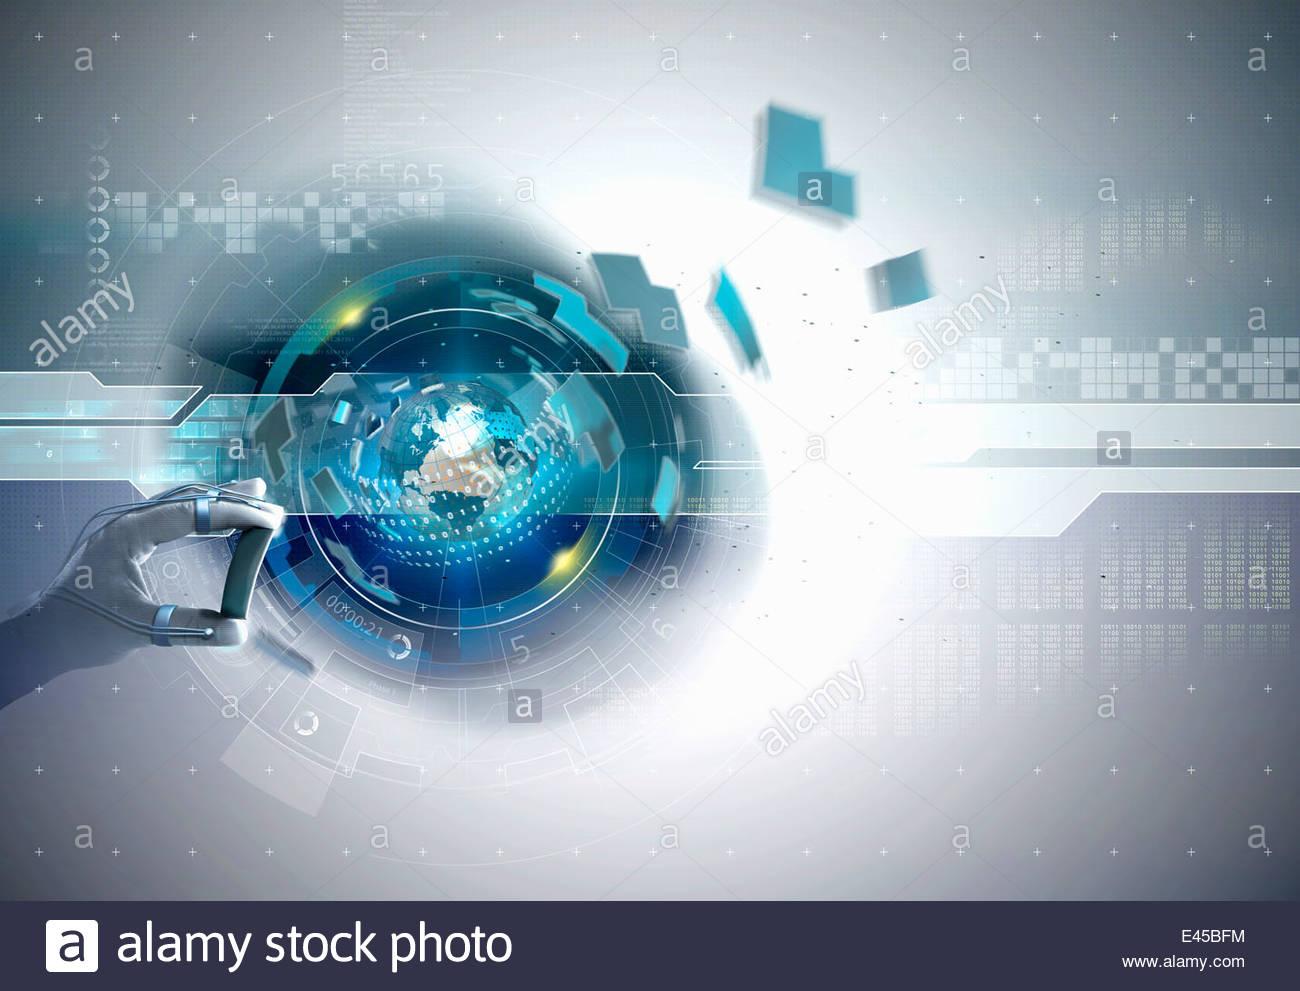 Raccord côté haute technologie morceau au cyberespace globe avec code binaire Photo Stock